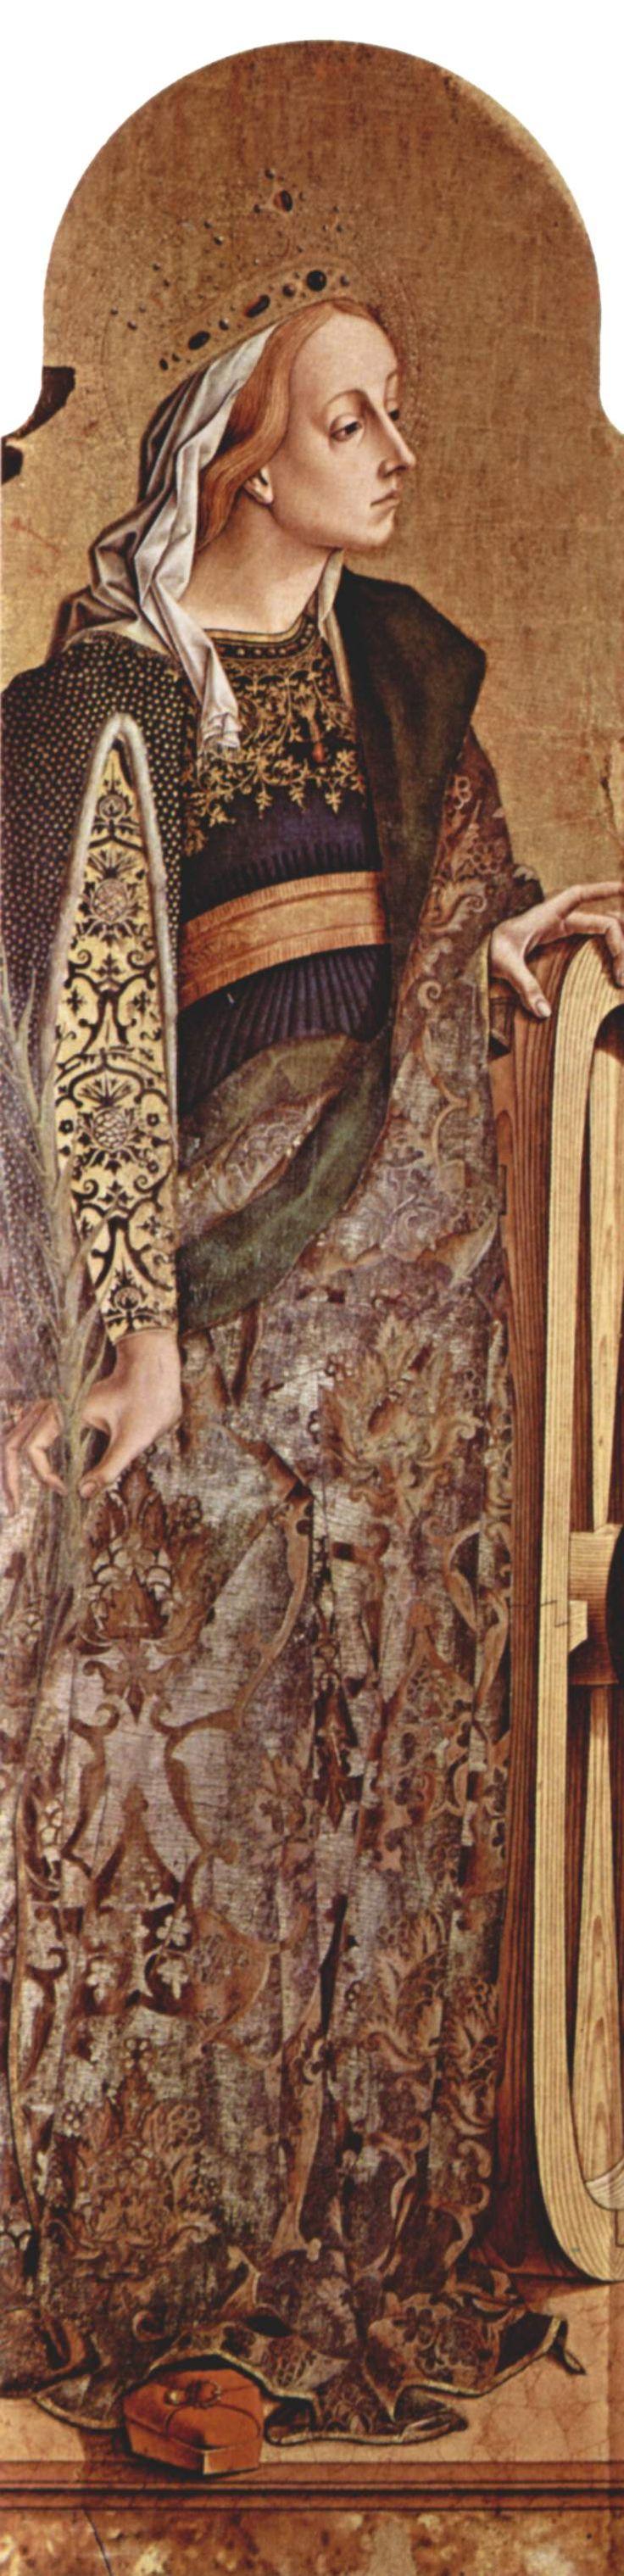 Saint Catherine of Alexandria Artist: Carlo Crivelli Completion Date: c.1470 Technique: tempera Material: wood Dimensions: 174 x 54 cm